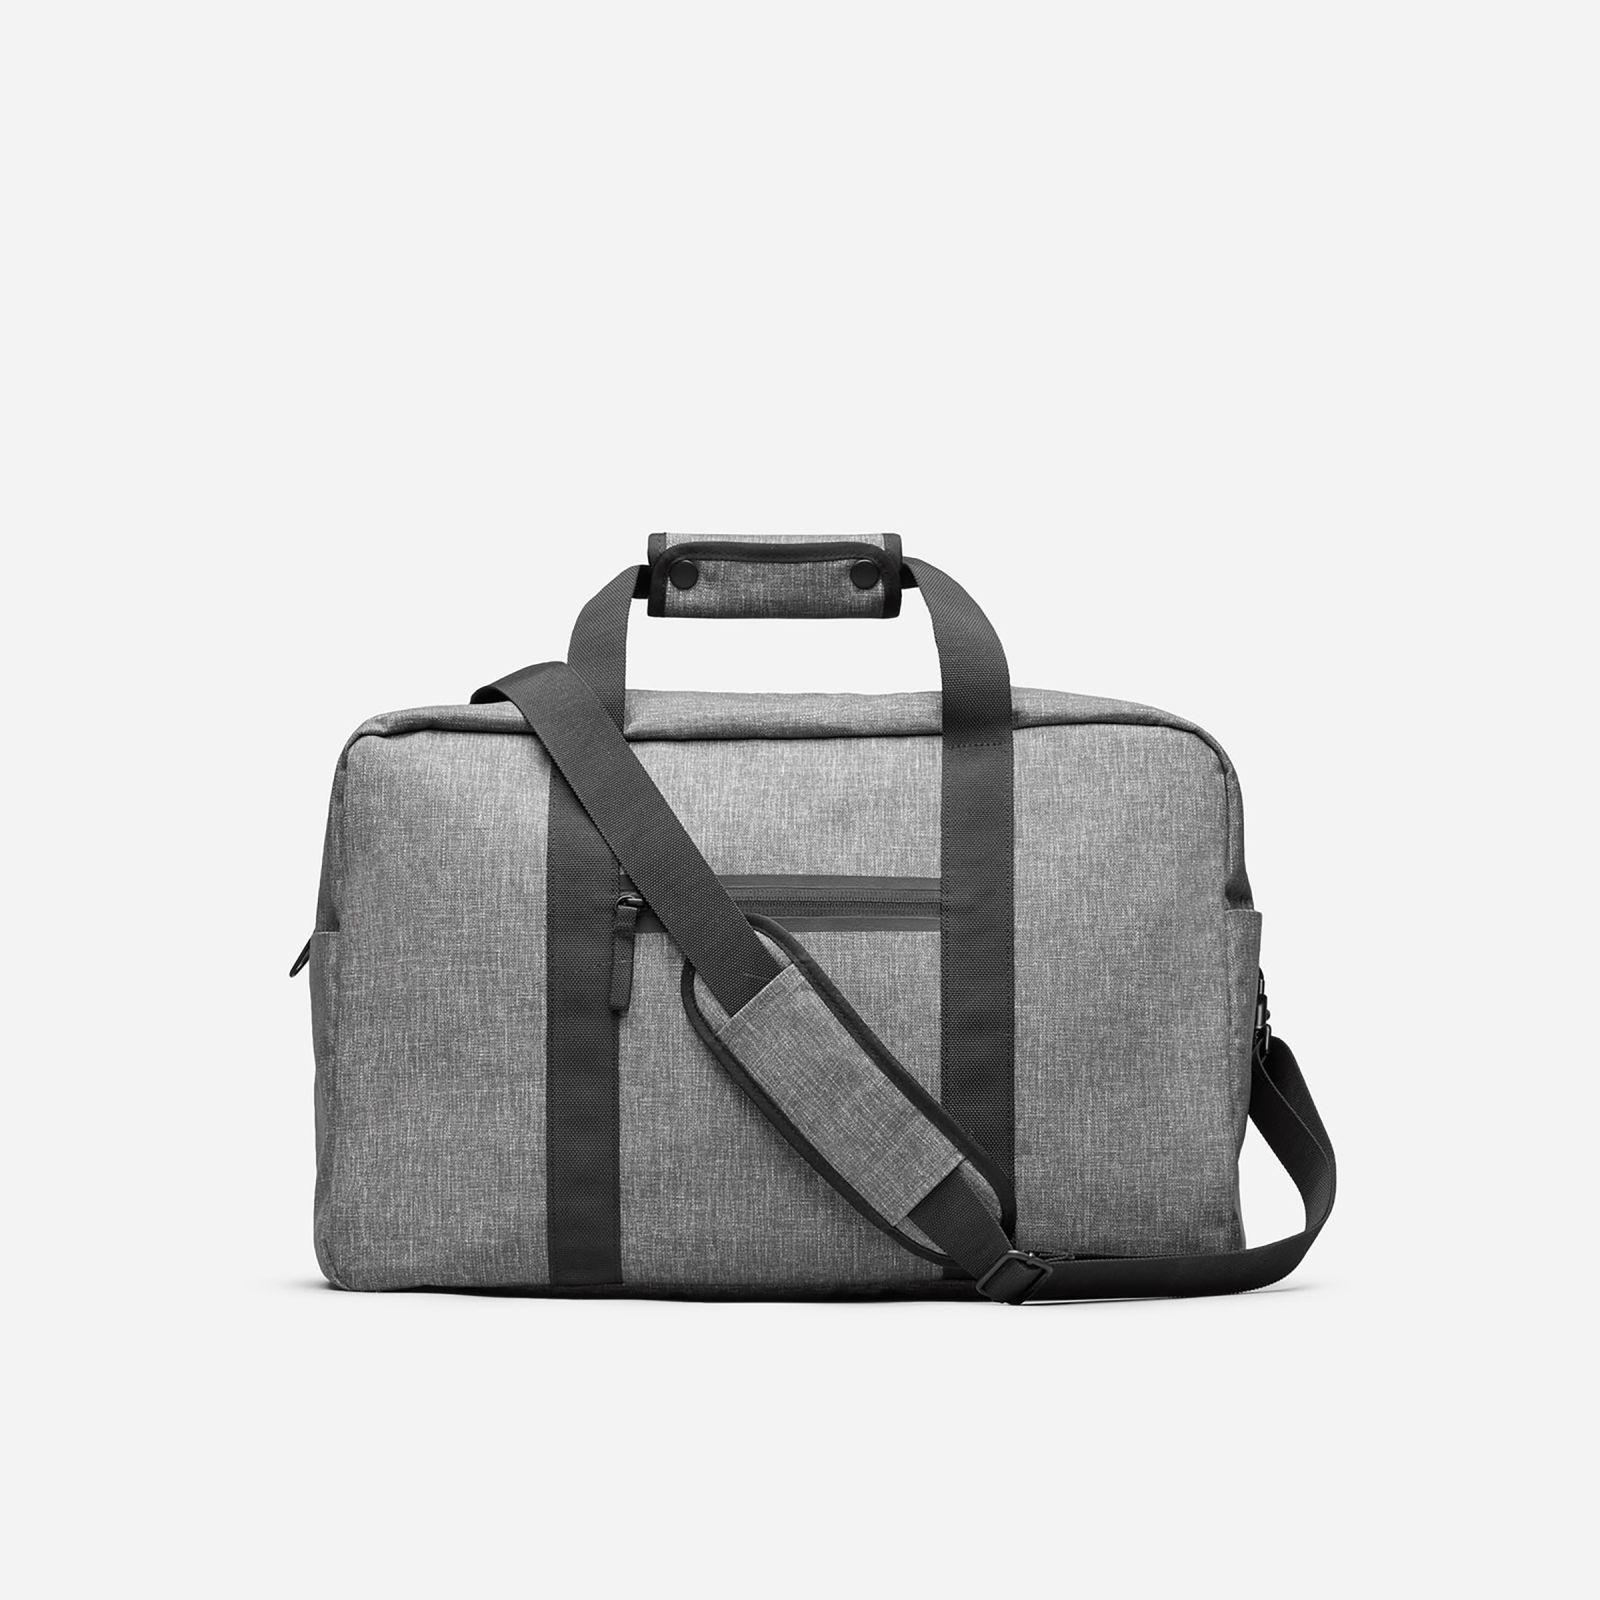 nylon weekender bag by everlane in light grey crosshatch